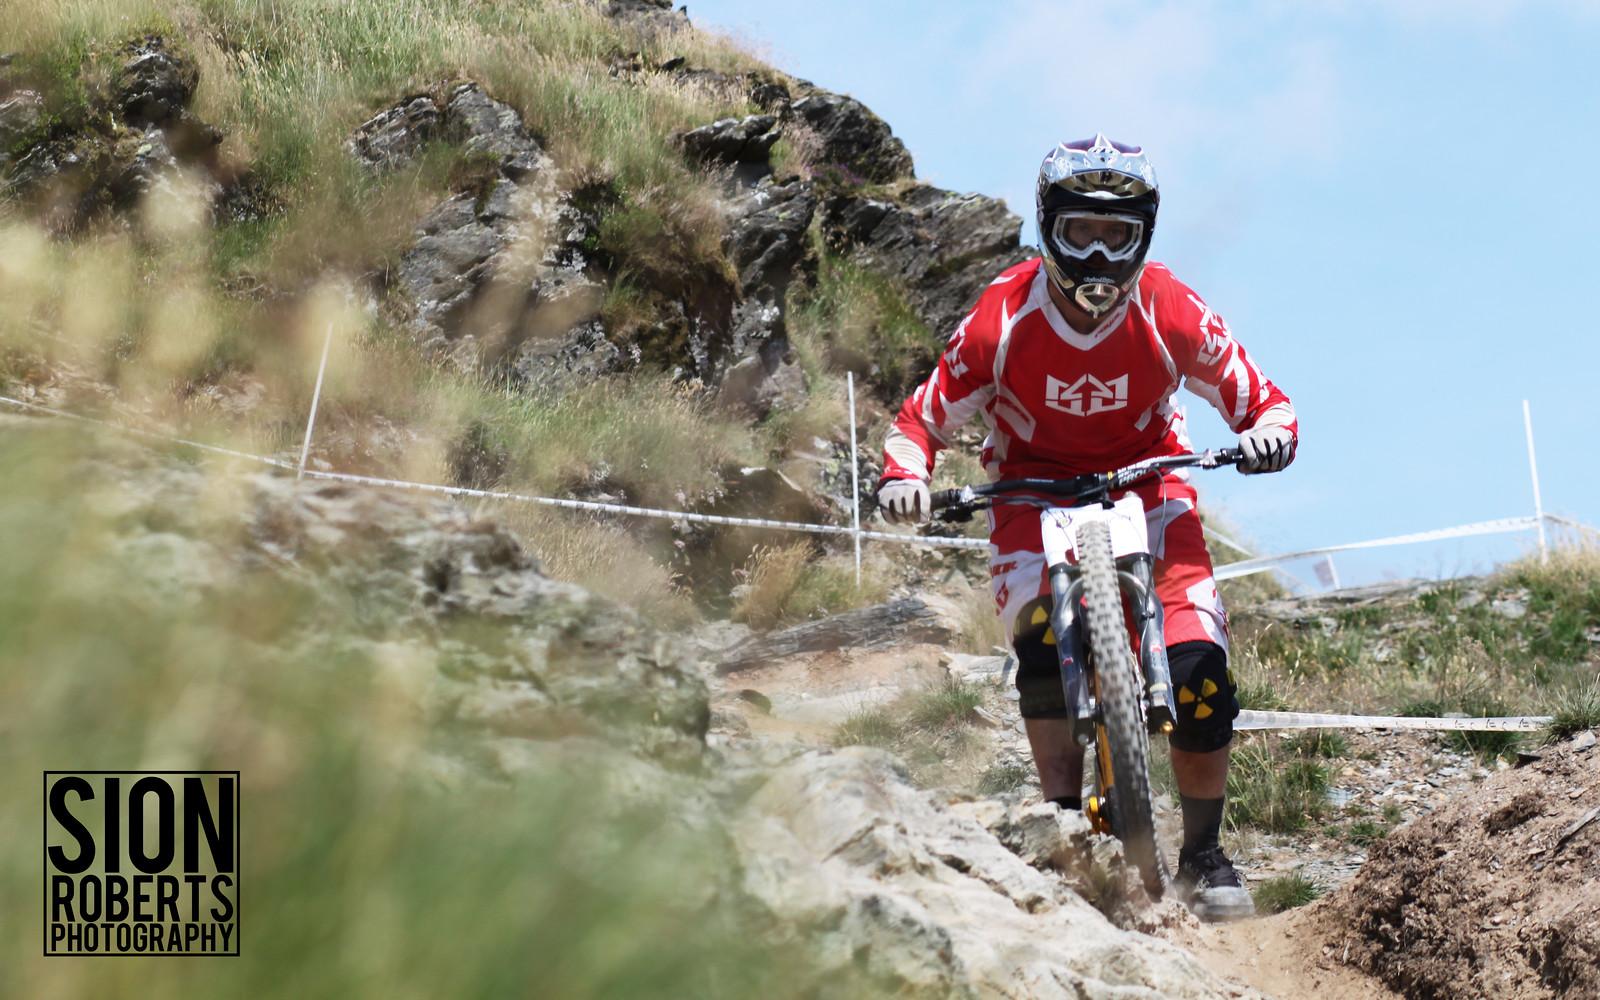 Al Bond  - sionr644 - Mountain Biking Pictures - Vital MTB